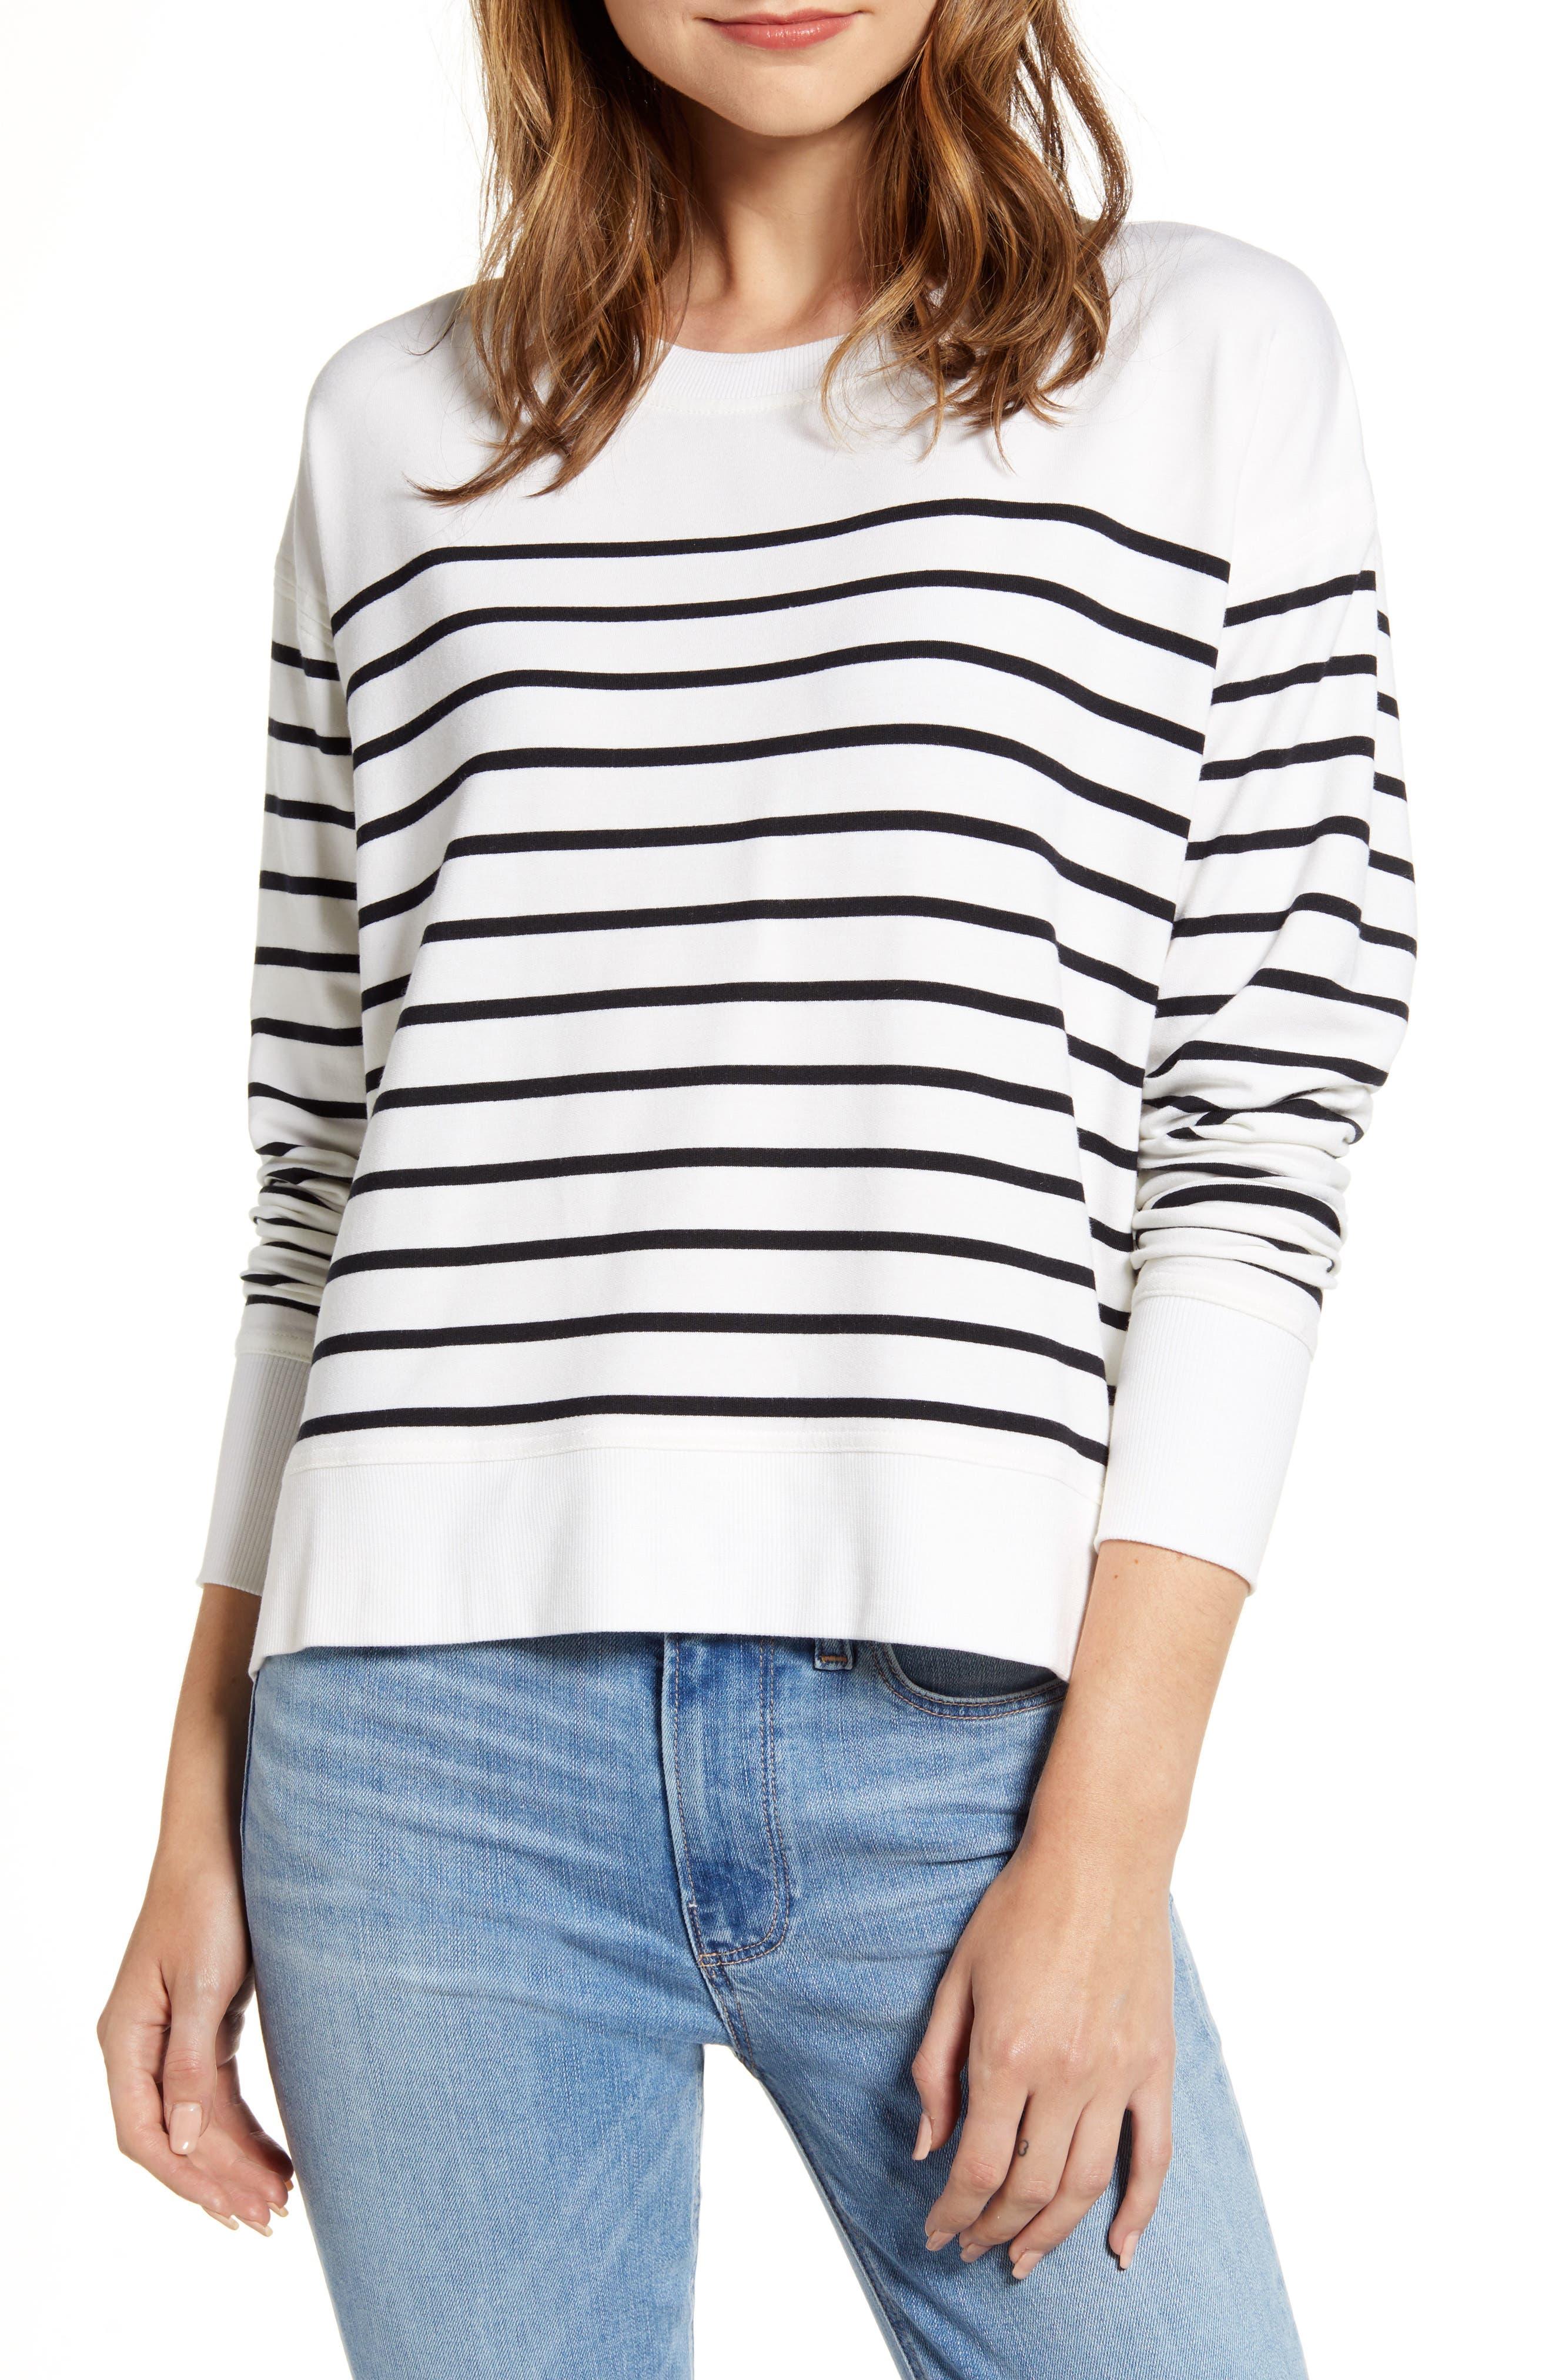 Vineyard Vines Stripe Crewneck Sweatshirt, White